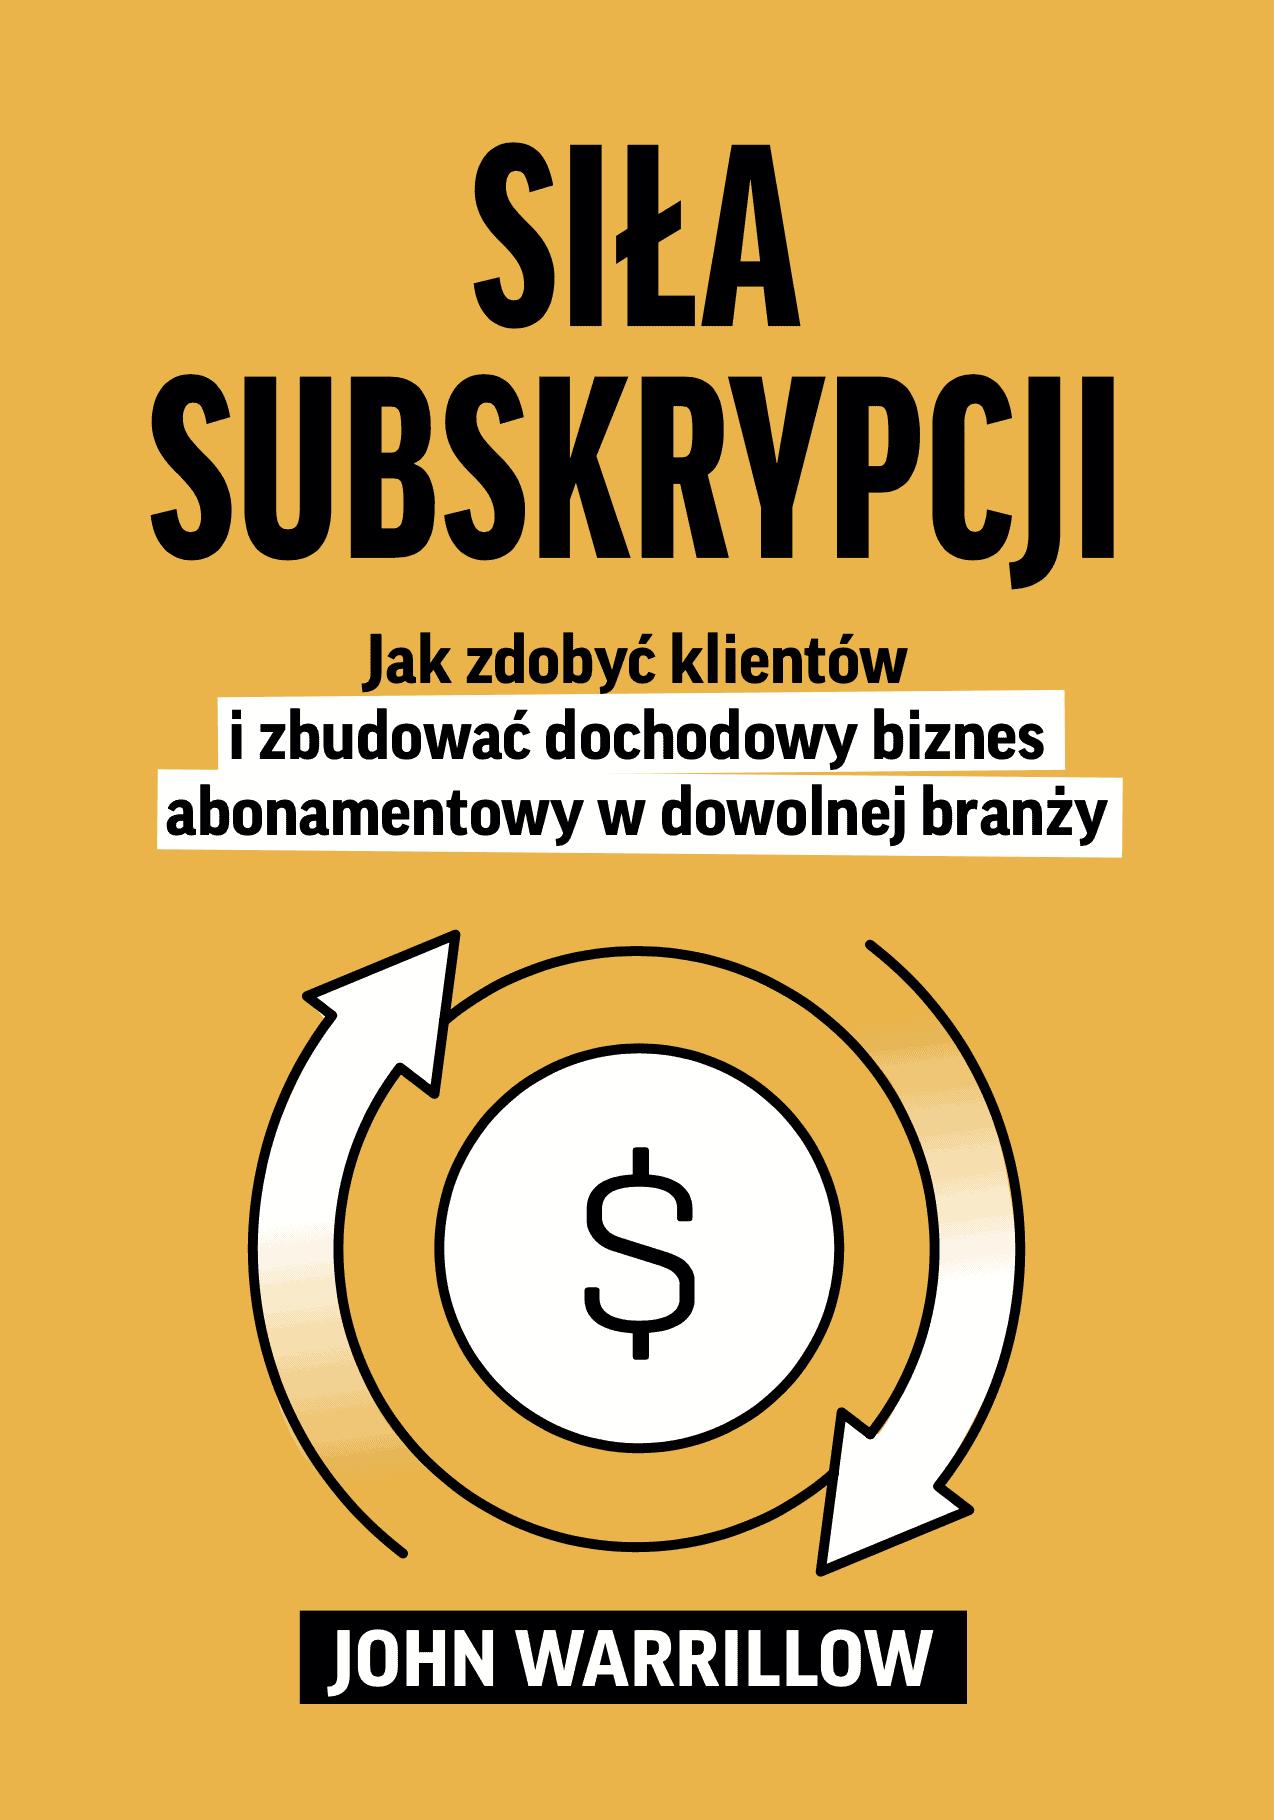 Siła subskrypcji